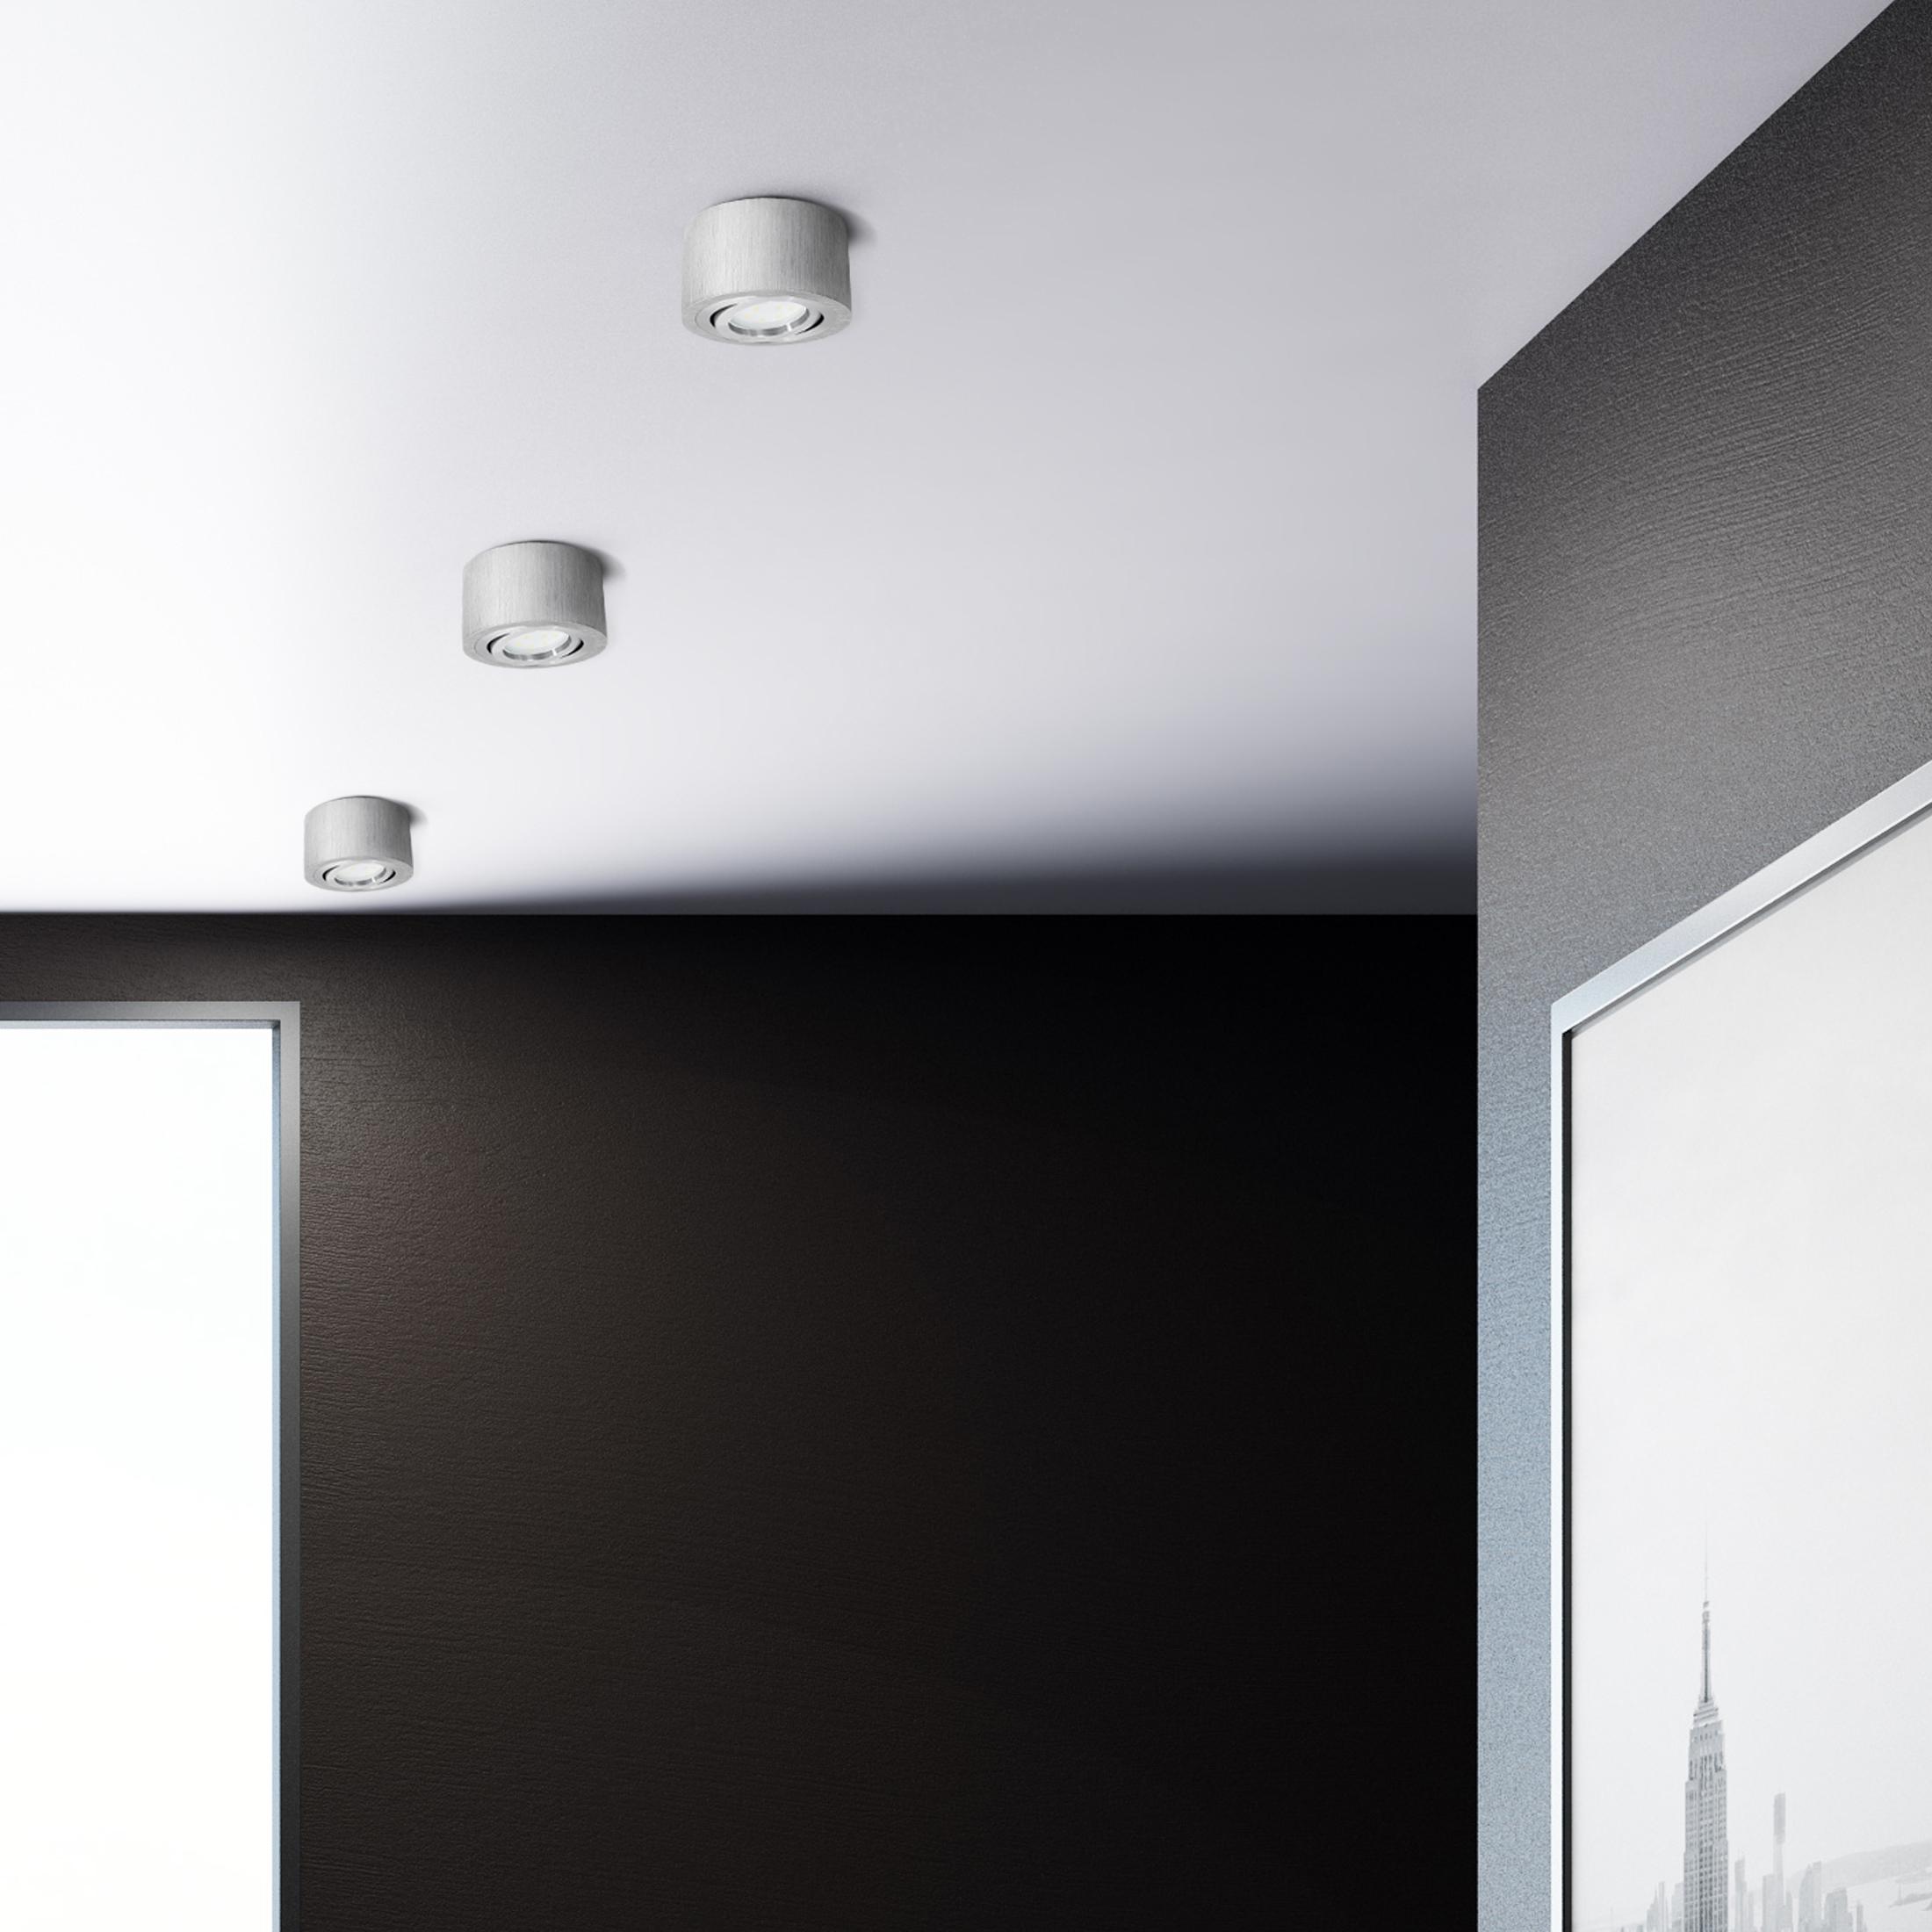 flacher decken aufbau spot alu geb rstet schwenkbar inkl led modul 5w warm weiss 230v. Black Bedroom Furniture Sets. Home Design Ideas